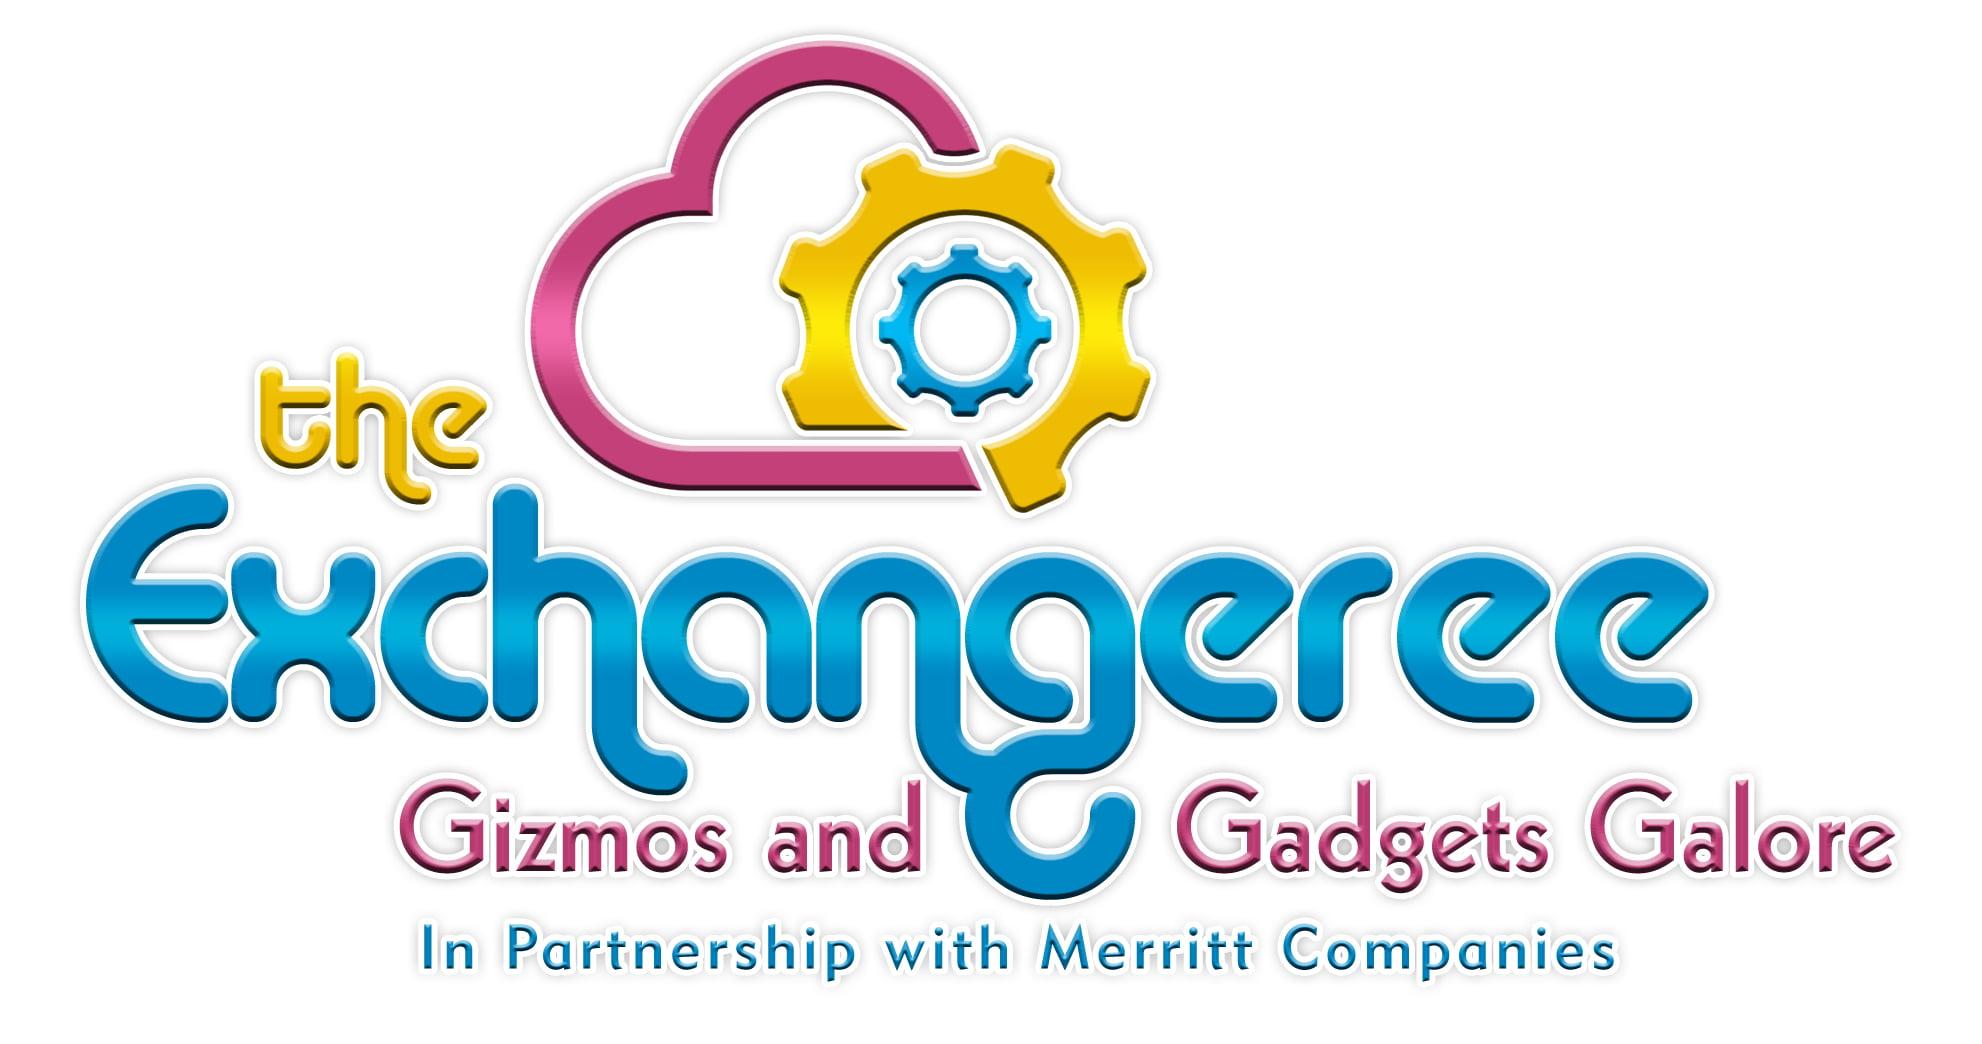 exchangeree_logo_FINAL_3D